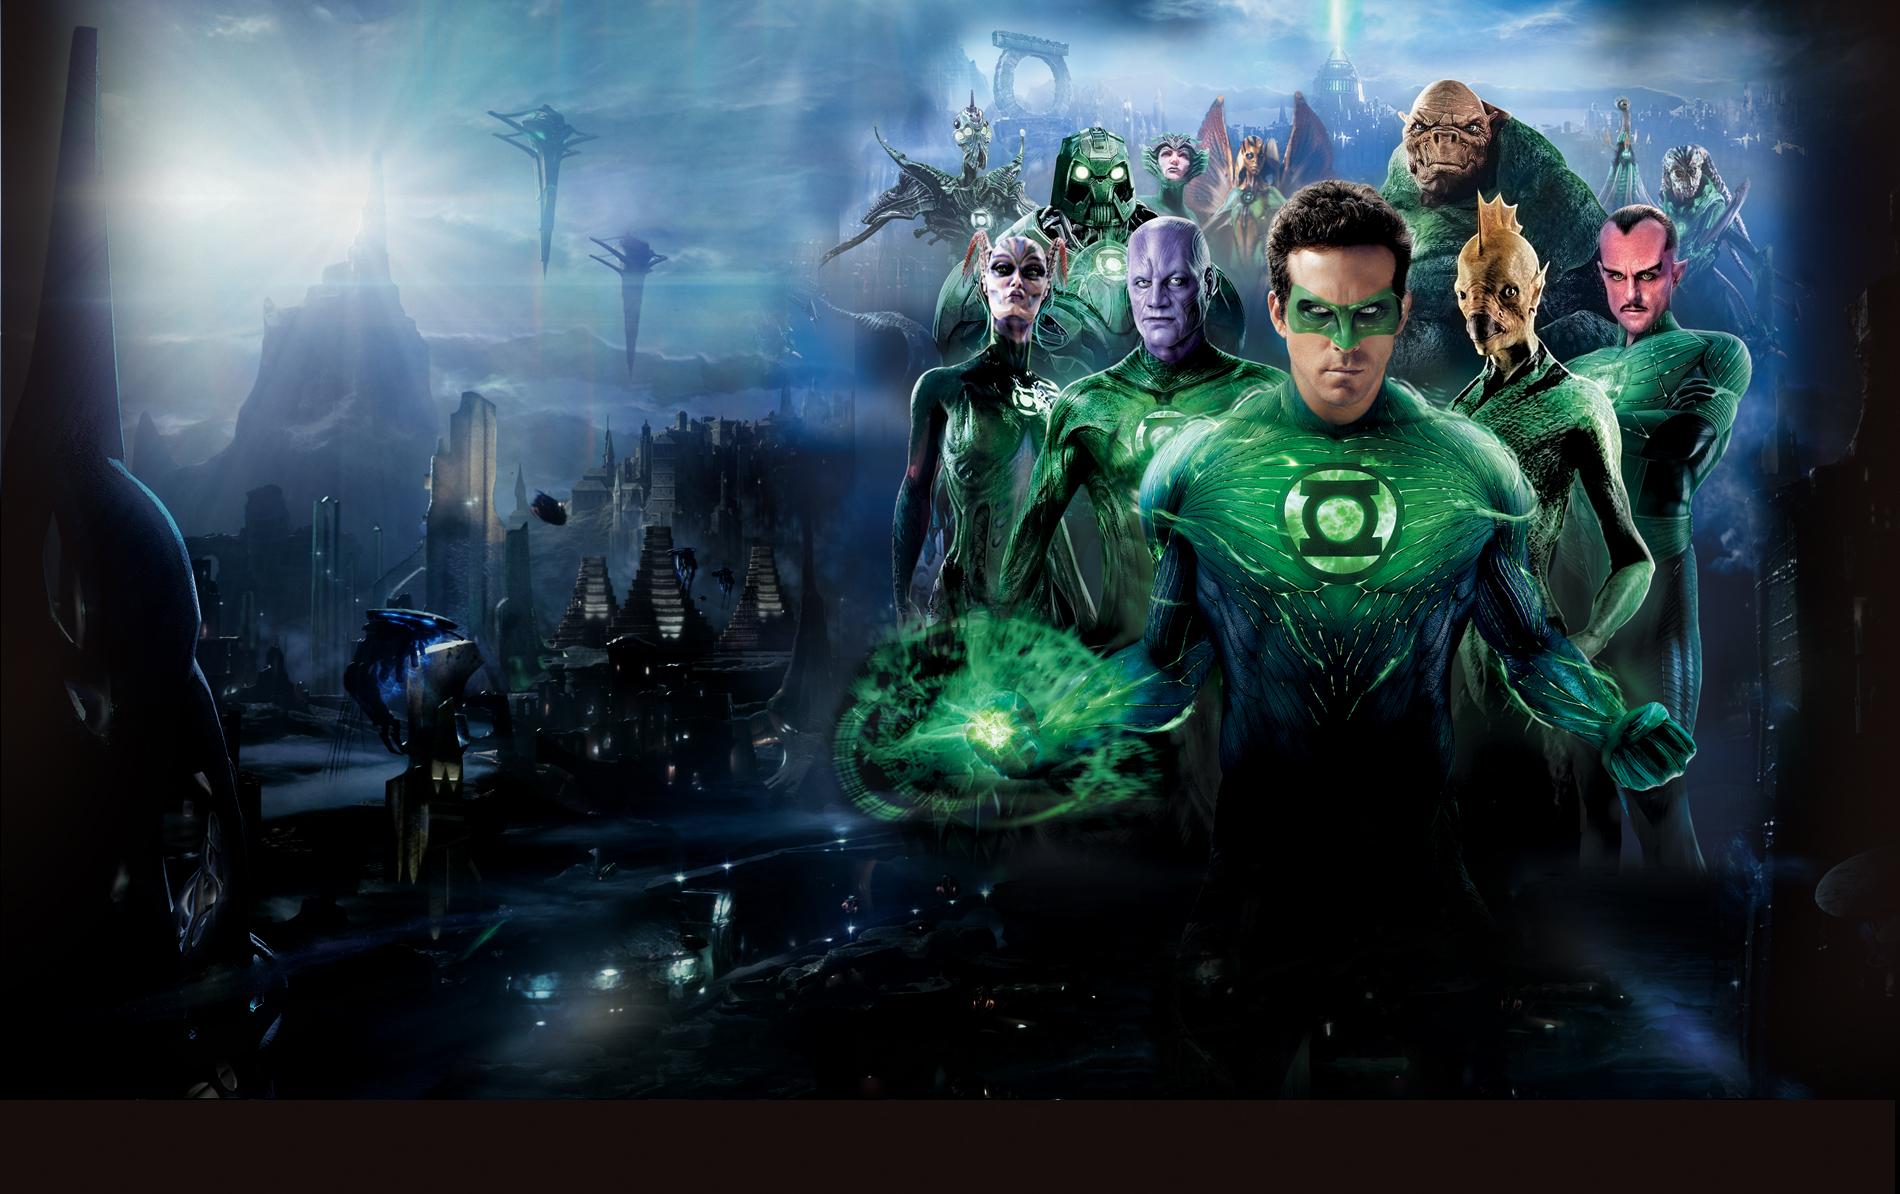 Green Lantern Judge Dredd